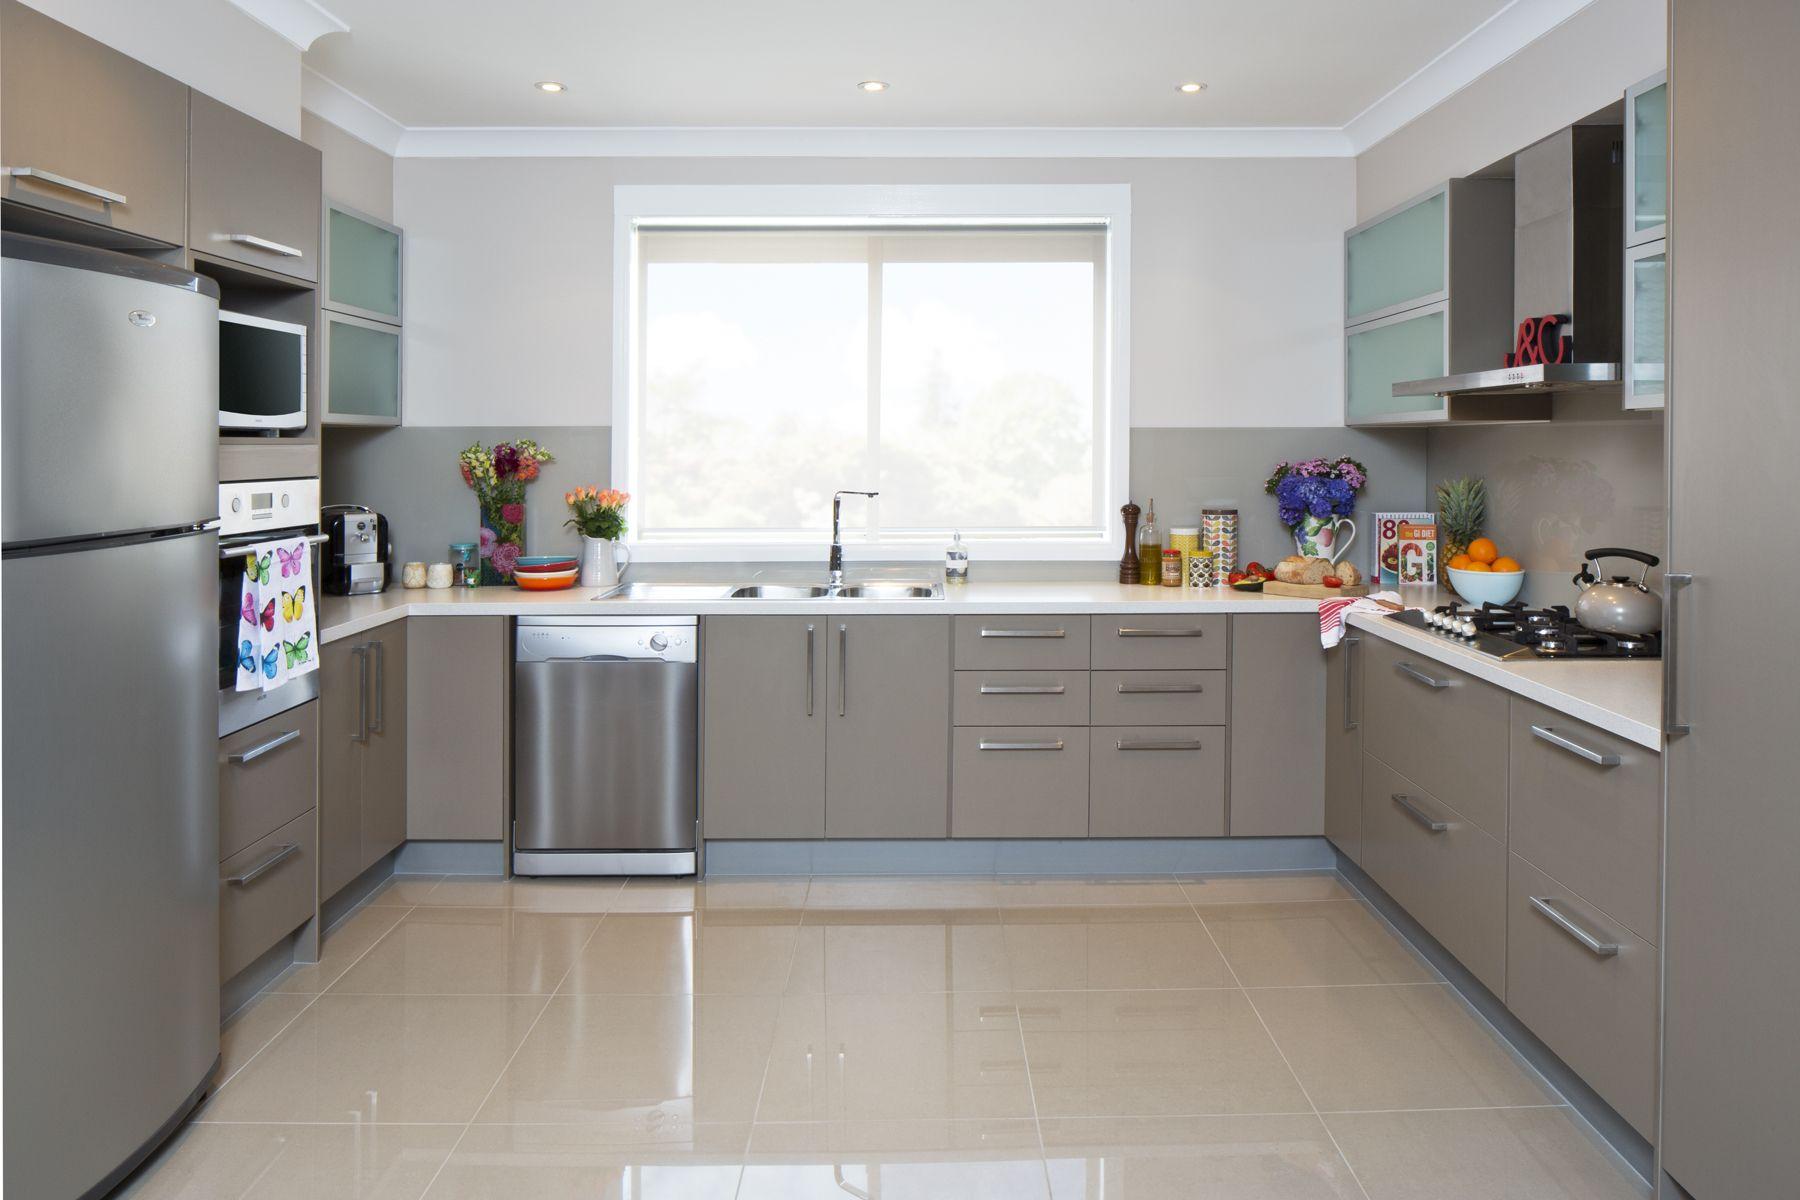 kaboodle kitchen kitchen renovation trends diy kitchen kitchen design on small kaboodle kitchen ideas id=88628